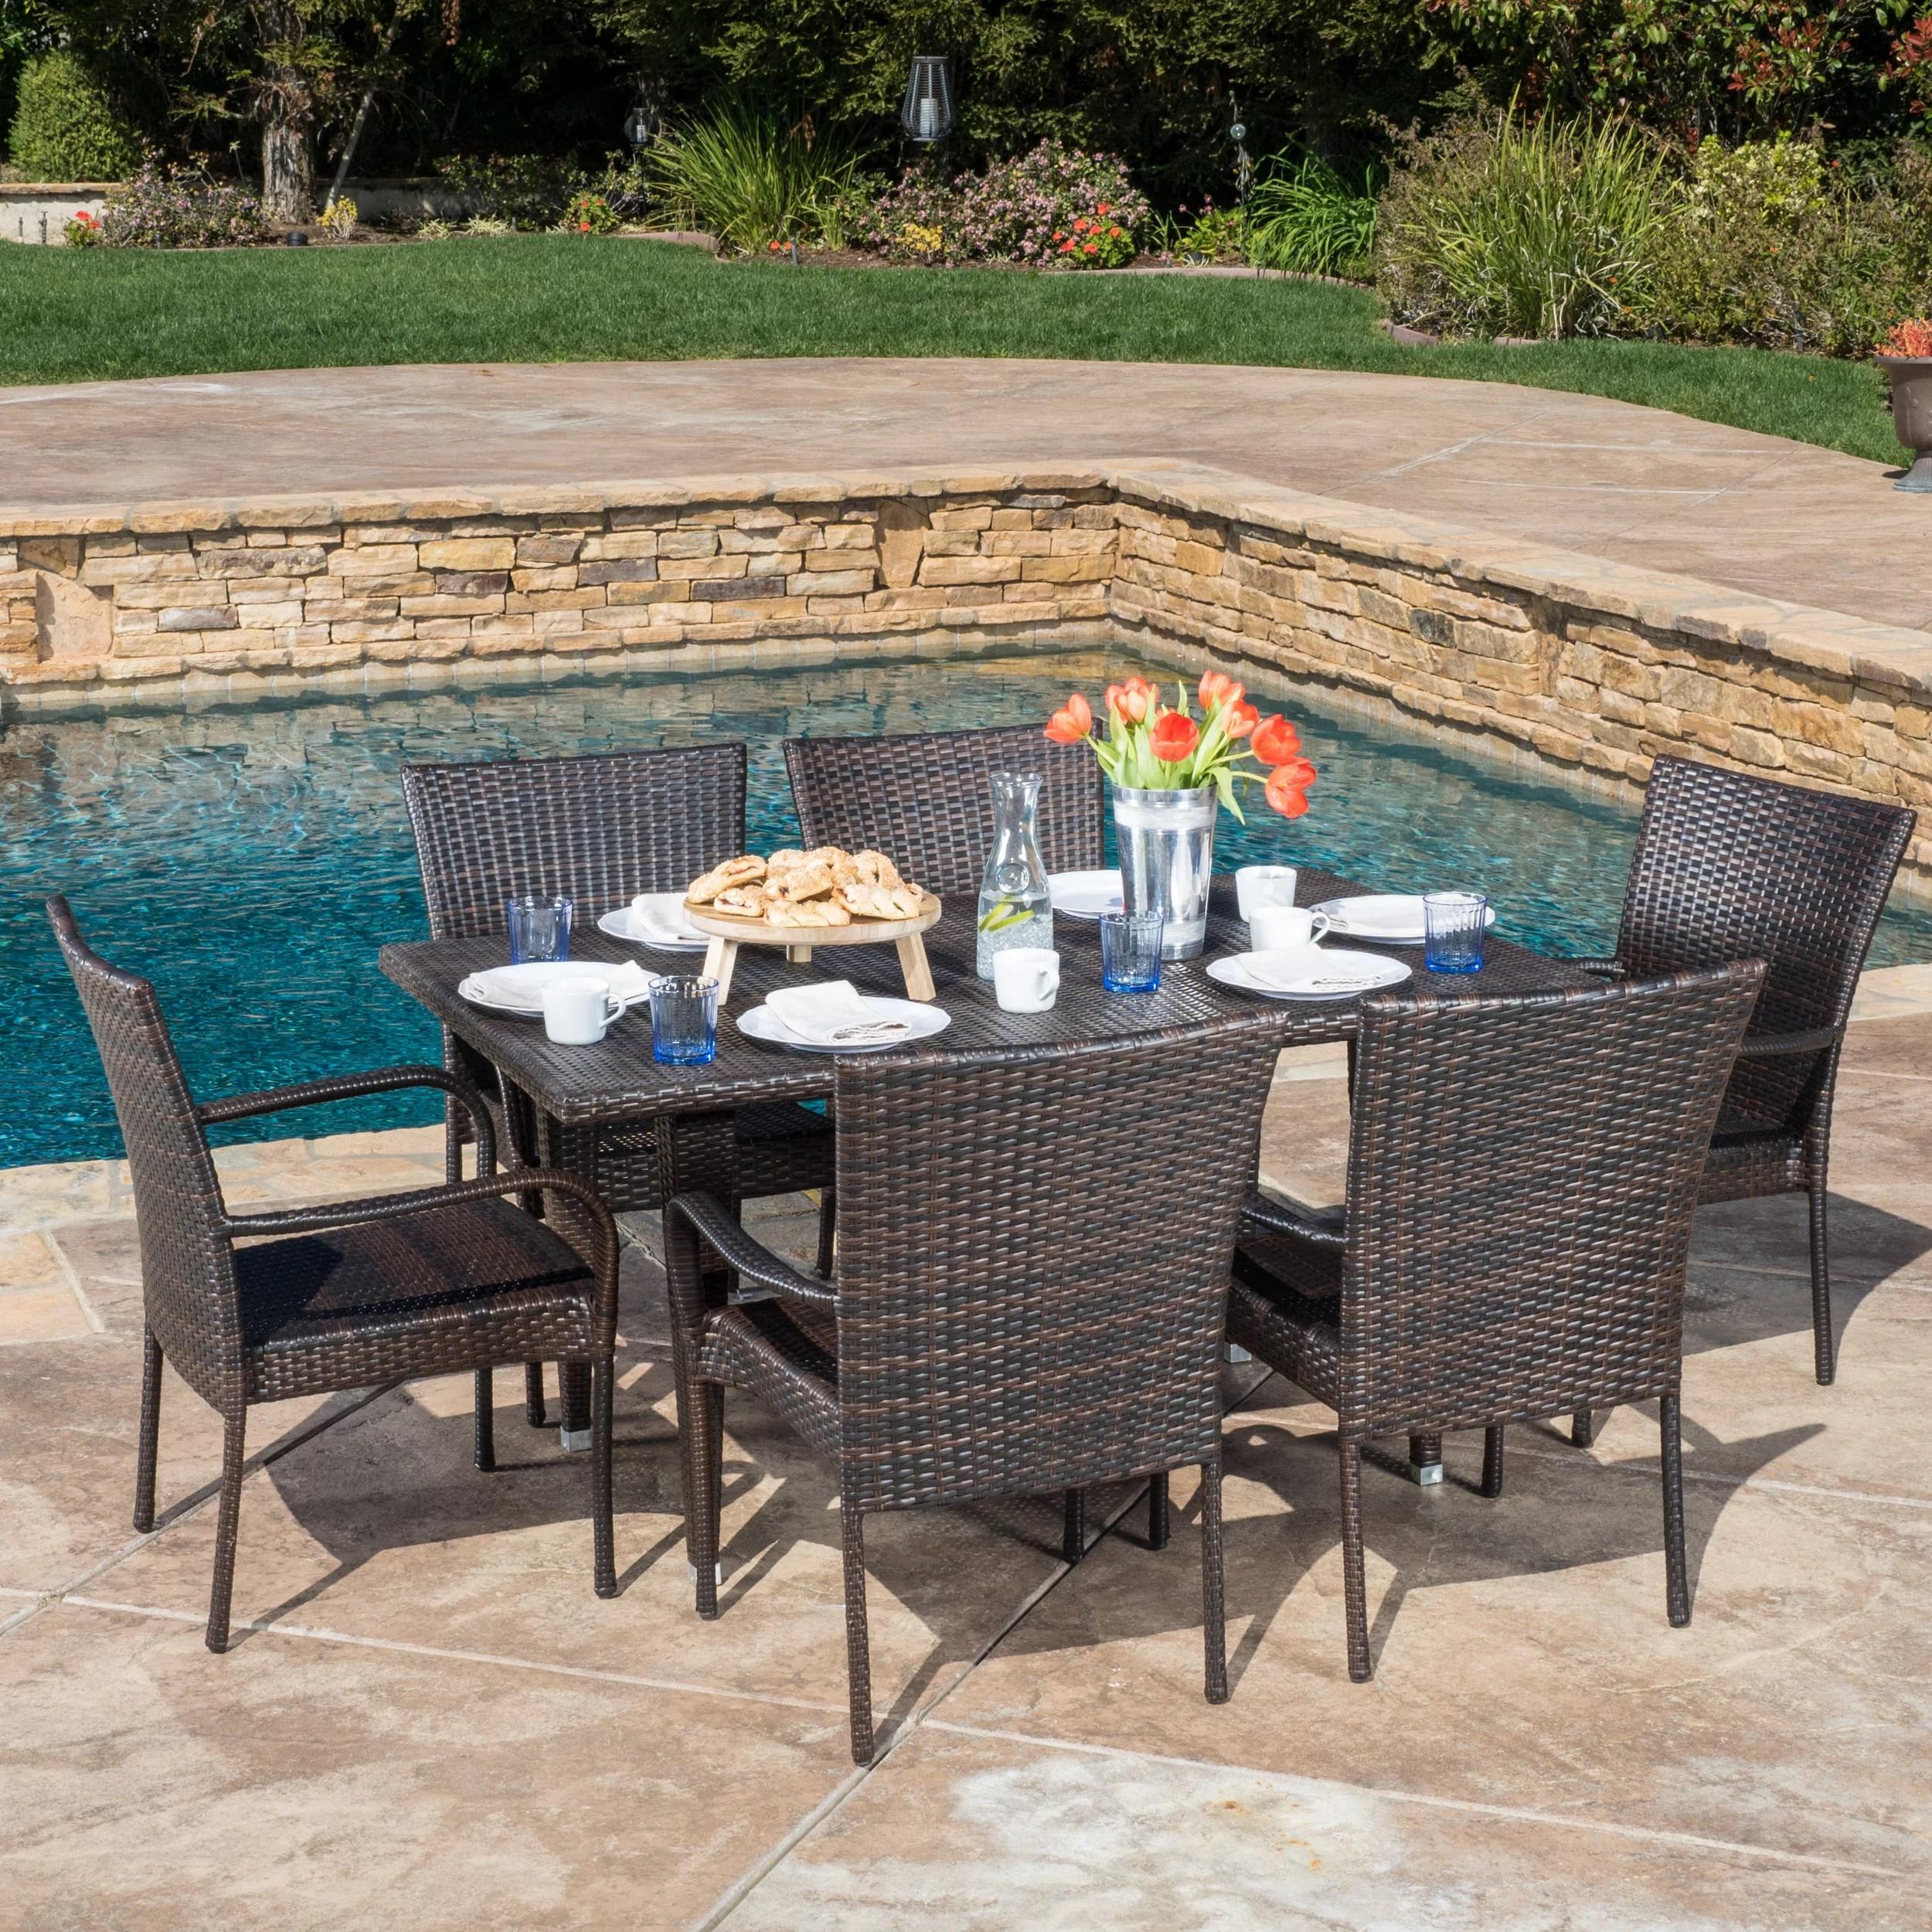 7 piece outdoor wicker patio dining sets Noble House Brow Outdoor Wicker 7 Piece Dining Set